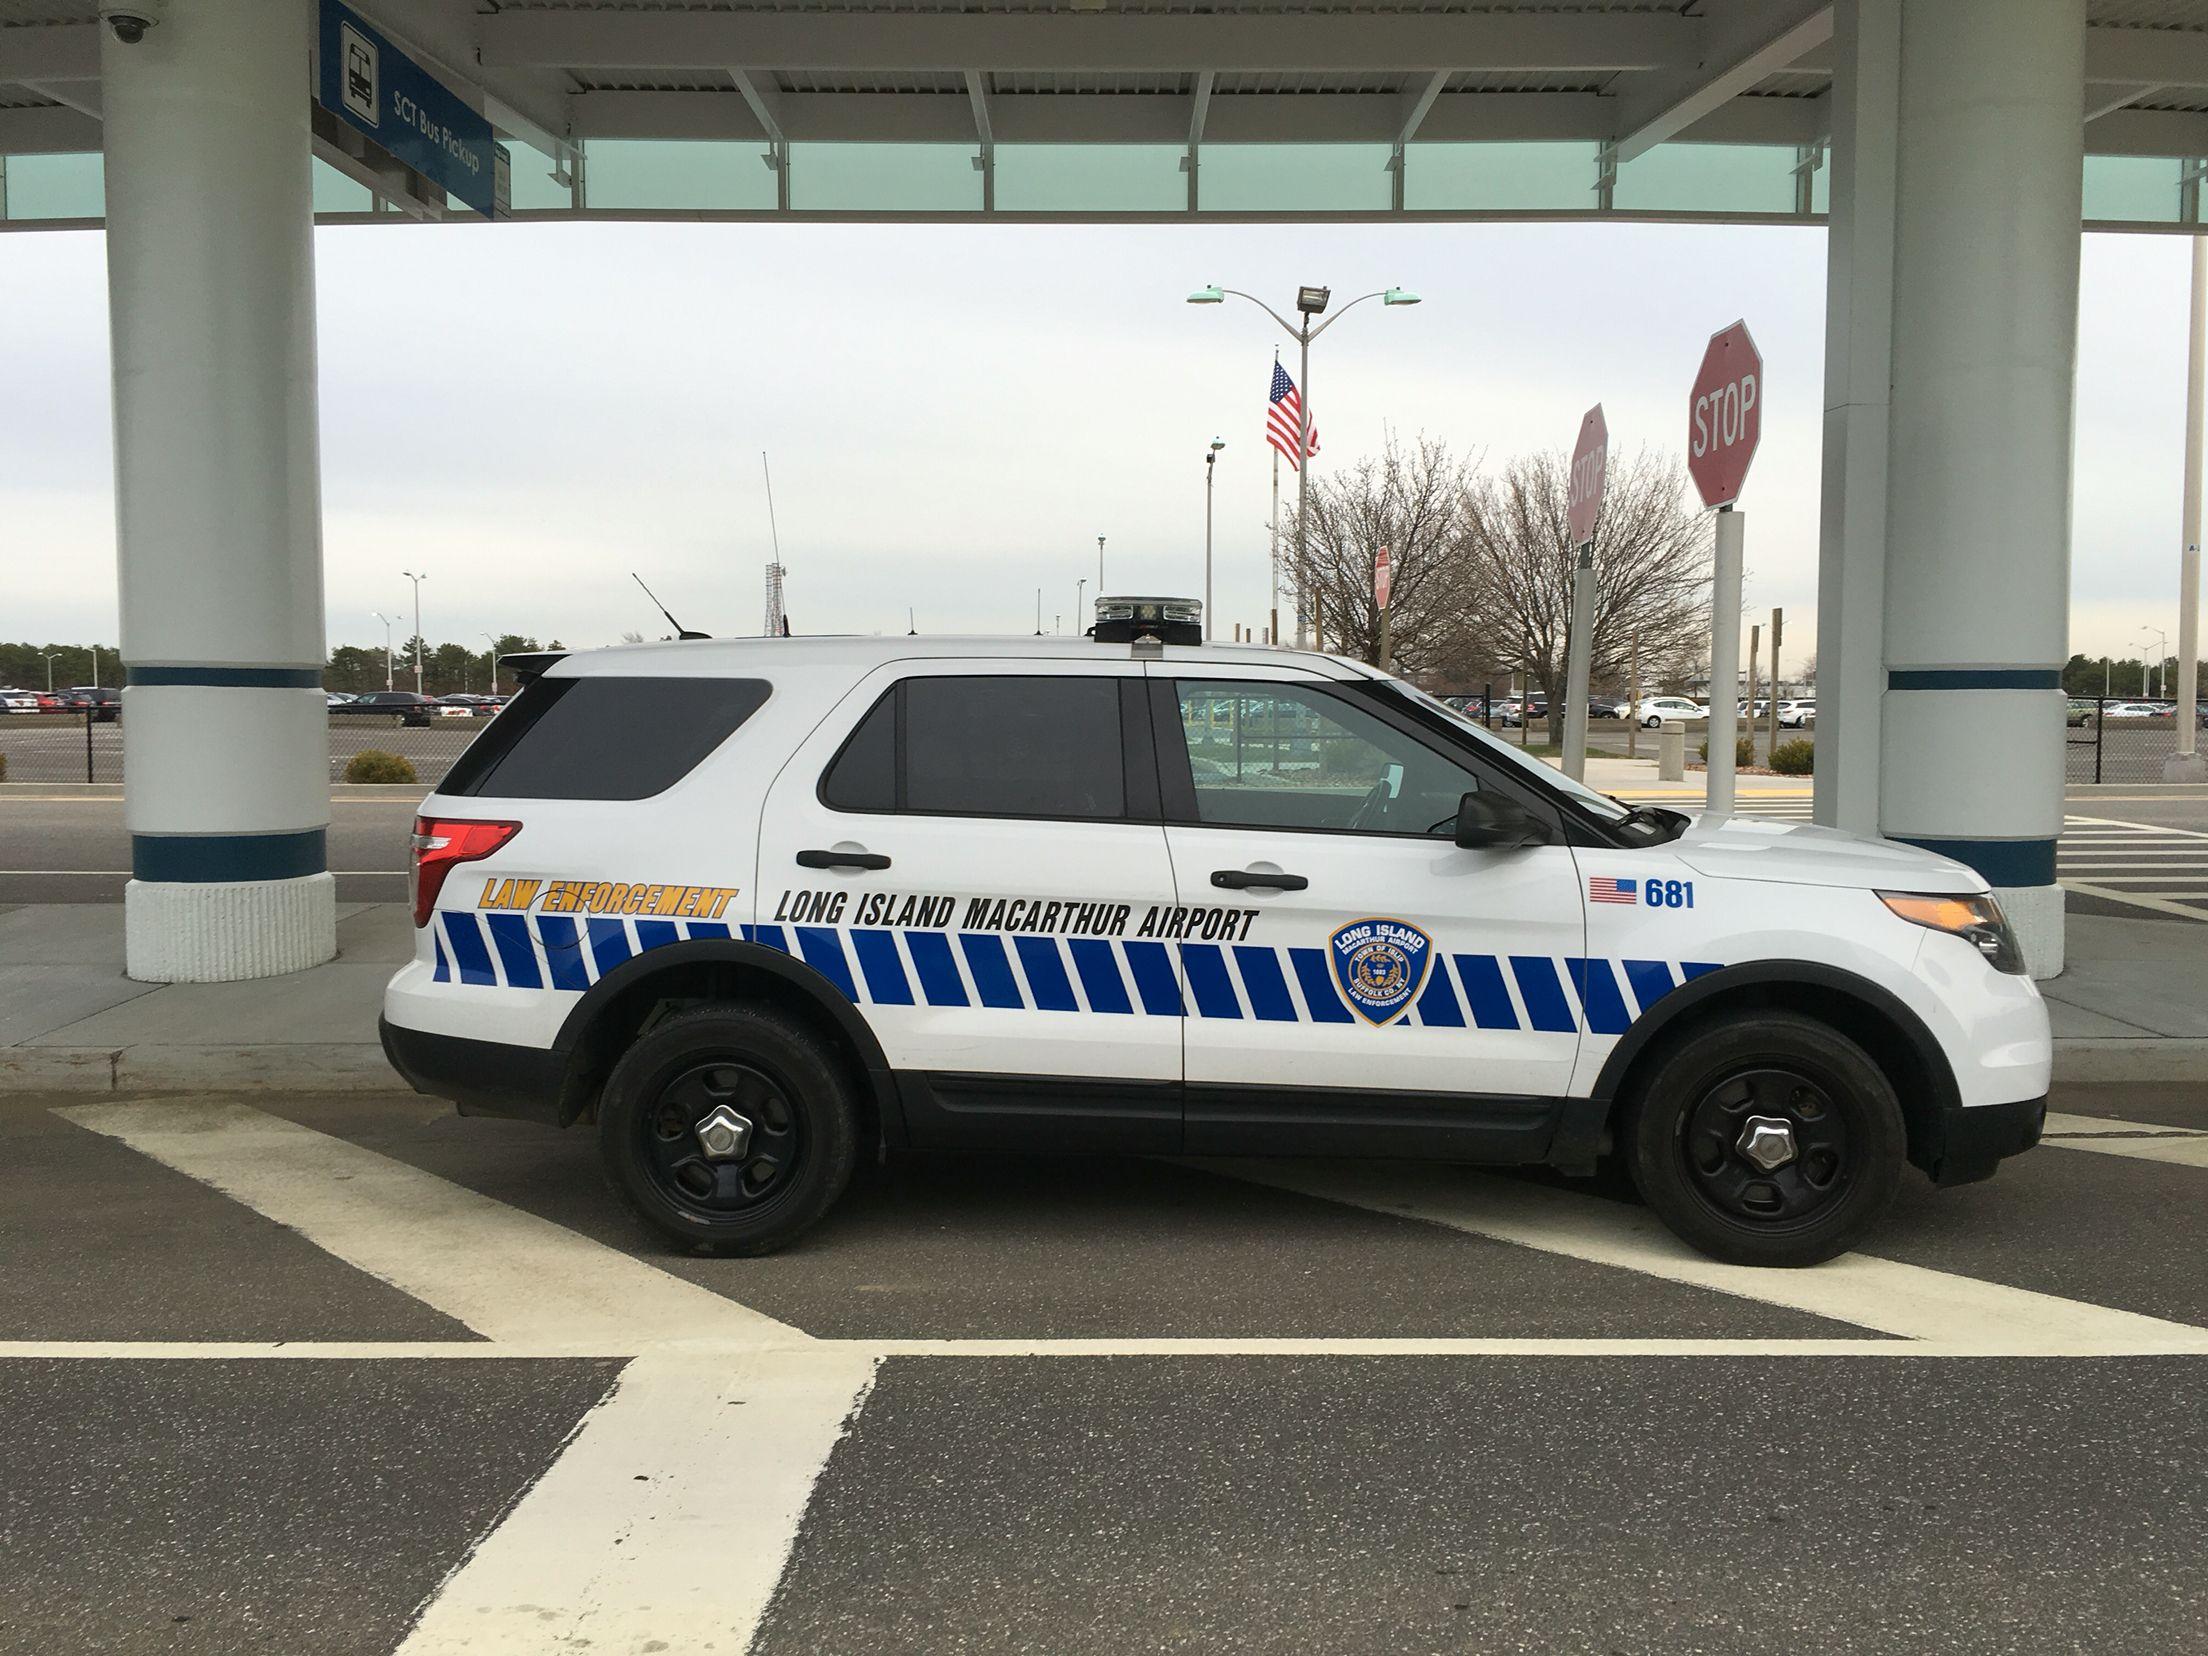 Long island macarthur airport police